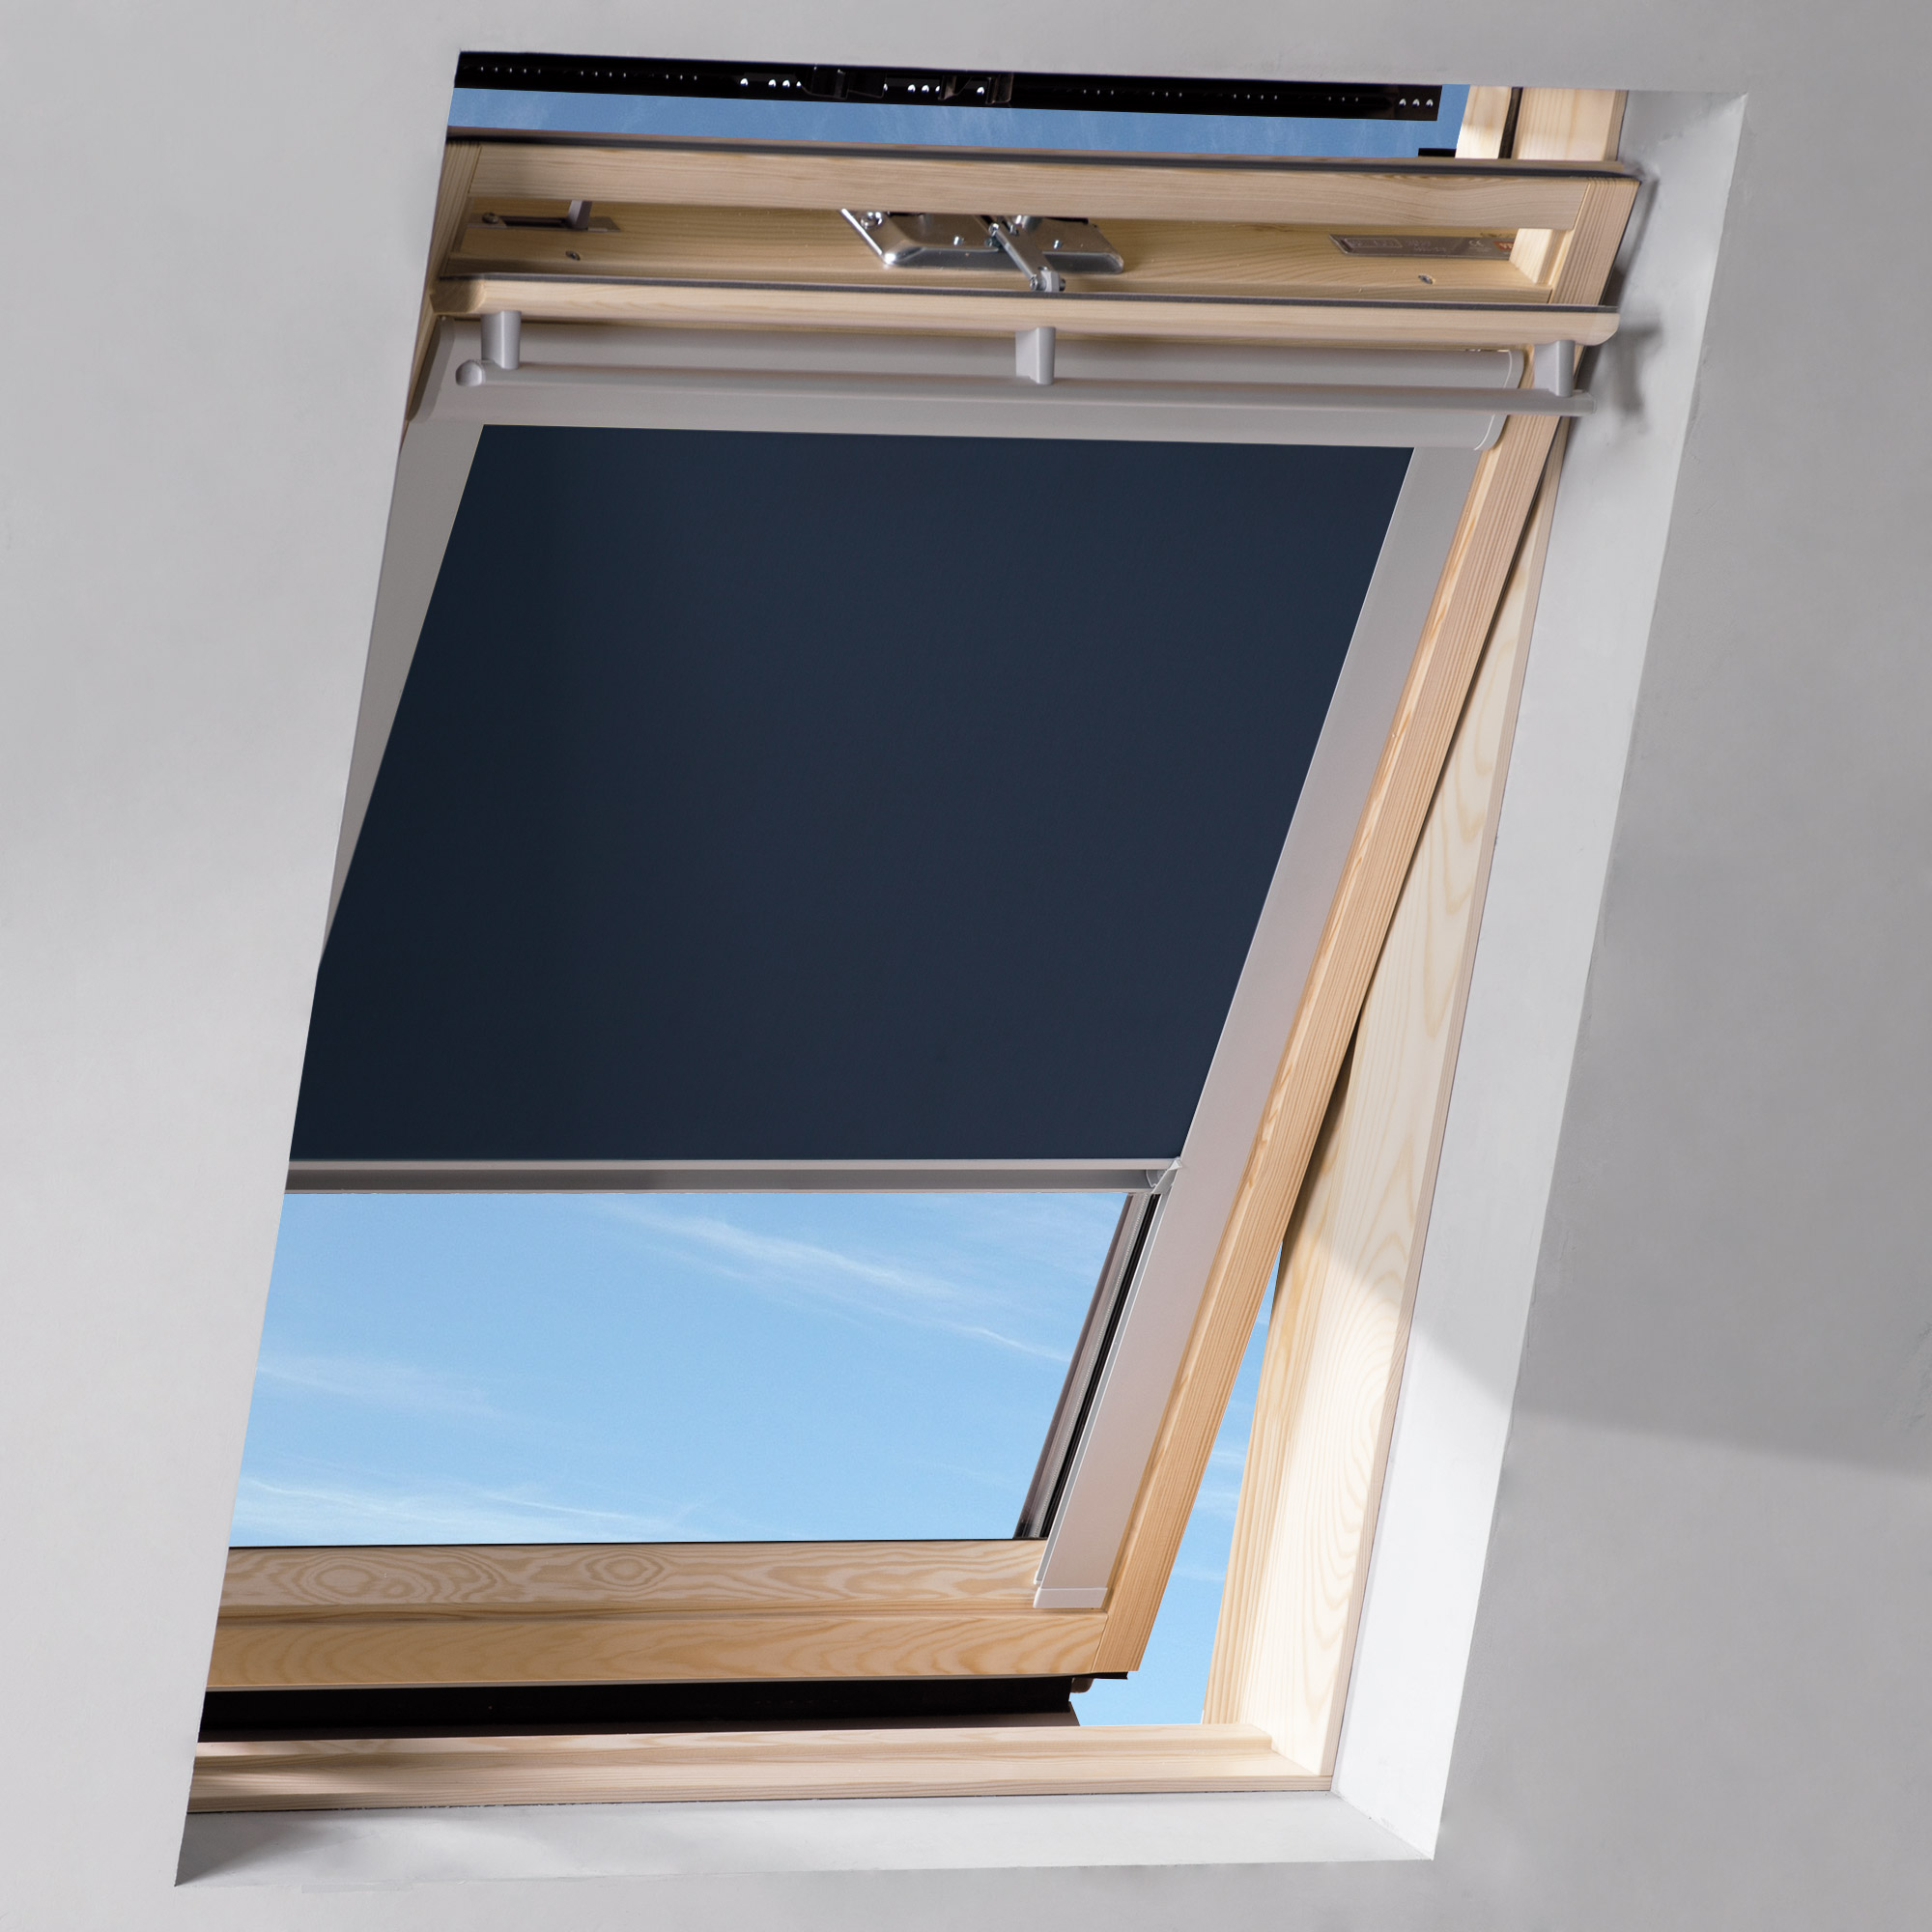 dachfenster rollo blau ggl ggu gzl ghl ghu gpu gpl m06 306 14 von sol royal hier kaufen im. Black Bedroom Furniture Sets. Home Design Ideas